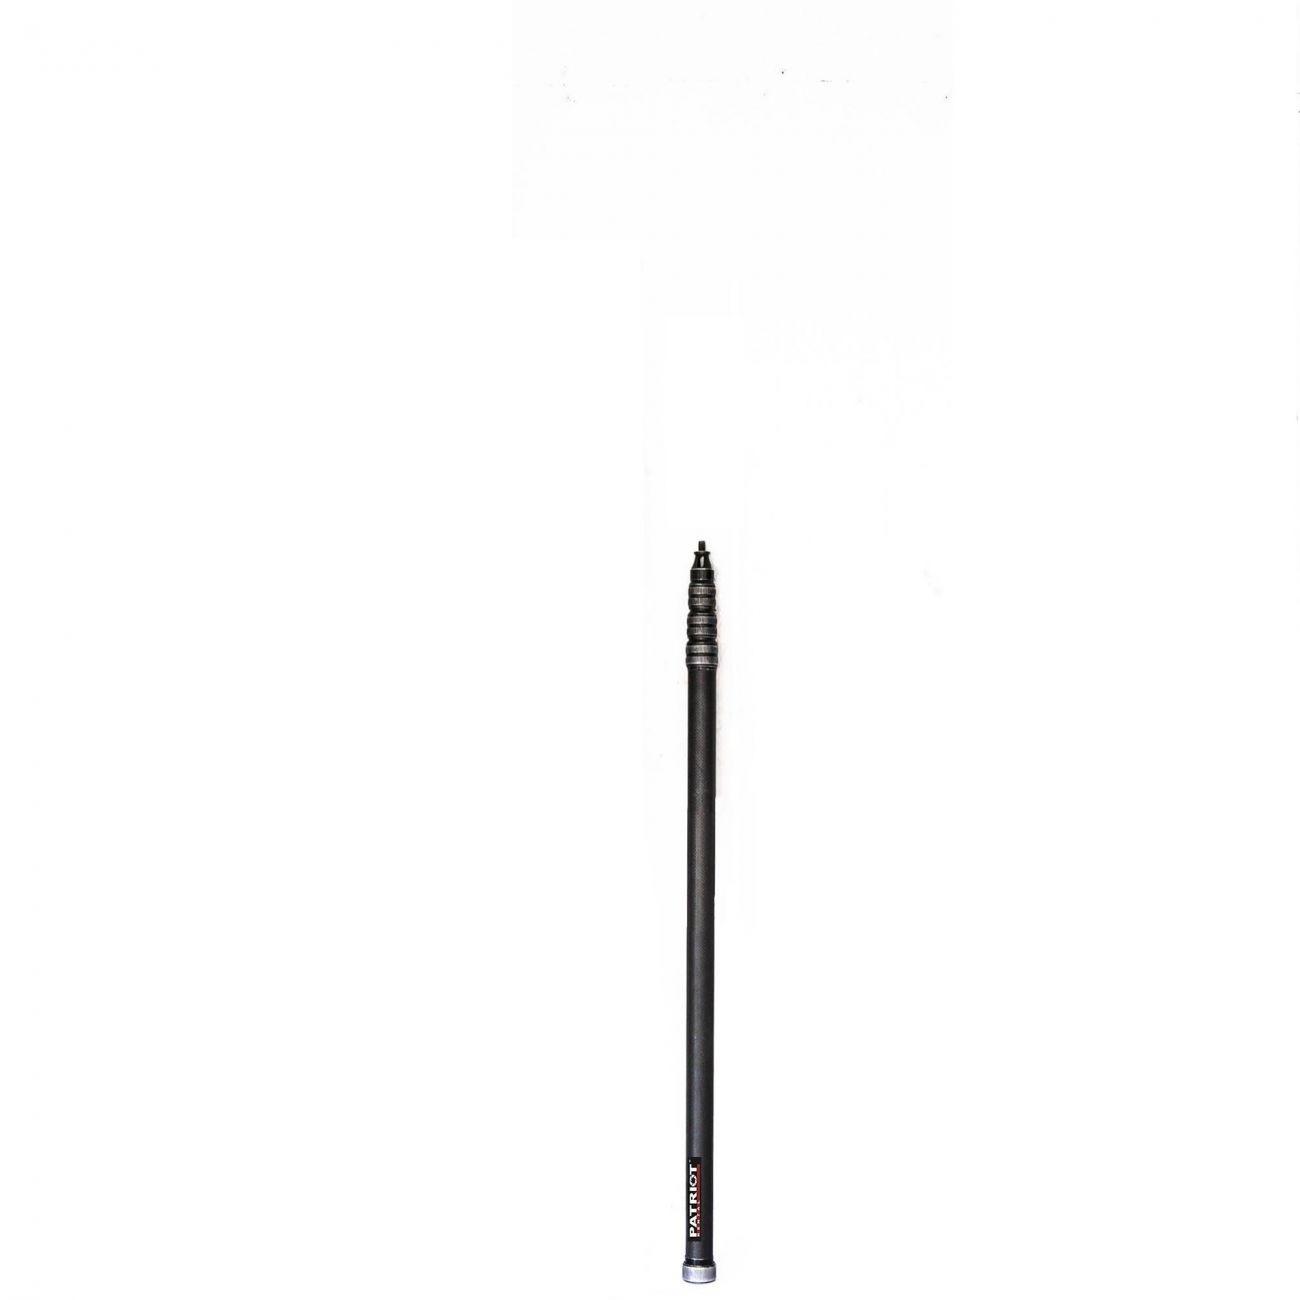 Boompole Ambient Recording QX 550 Quickpole Light 2m